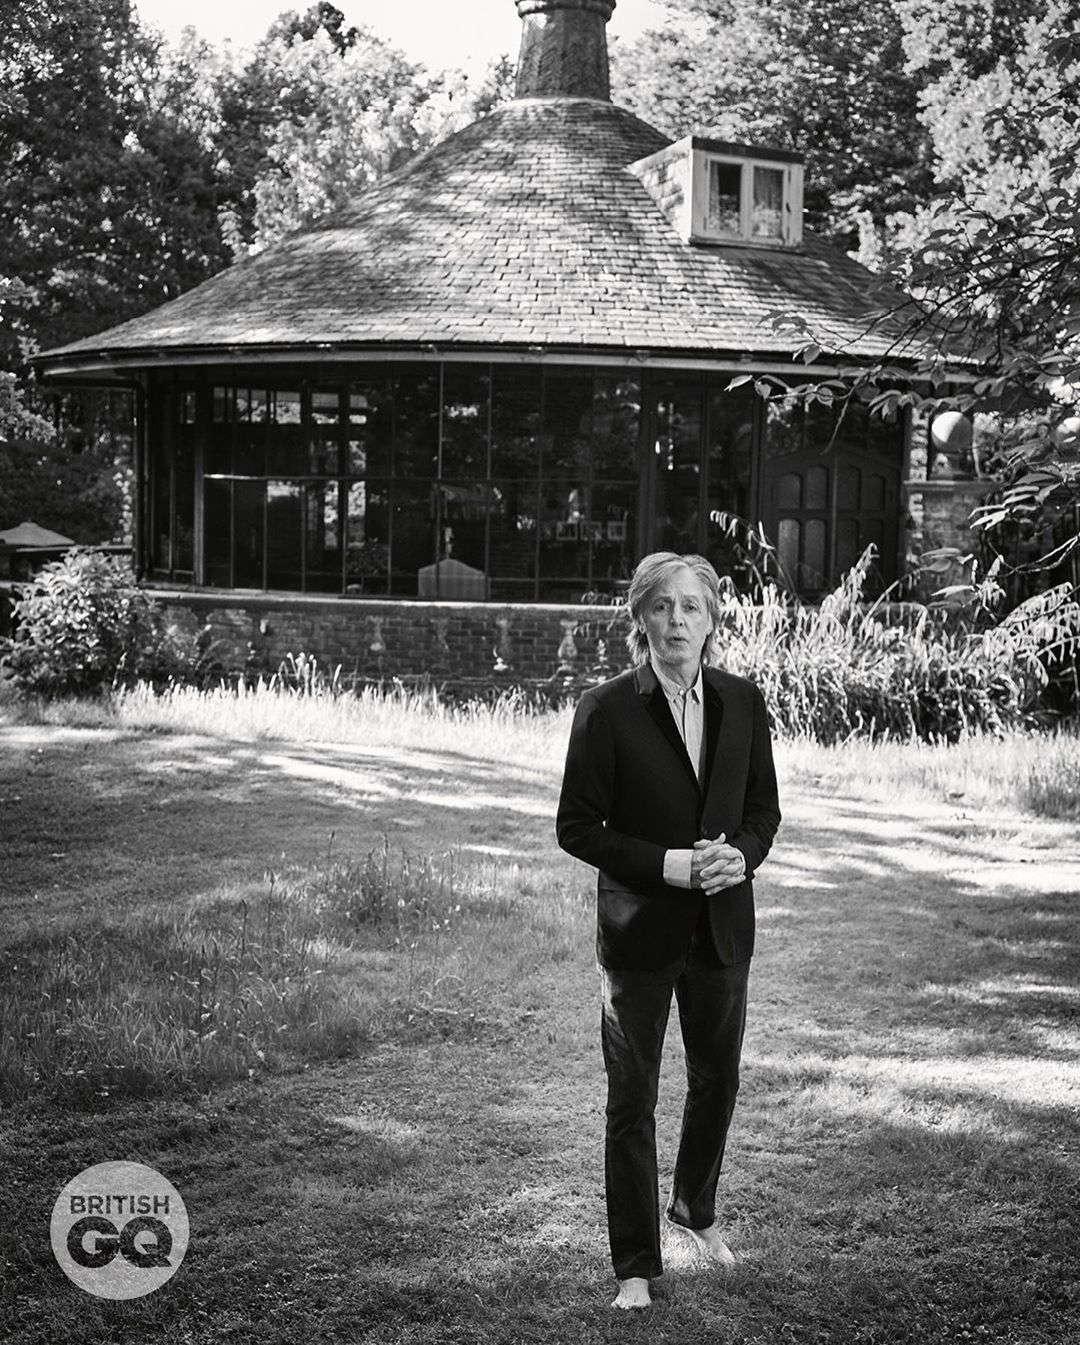 paul-mccartney-covers-british-gq-september-2020-magazine-06